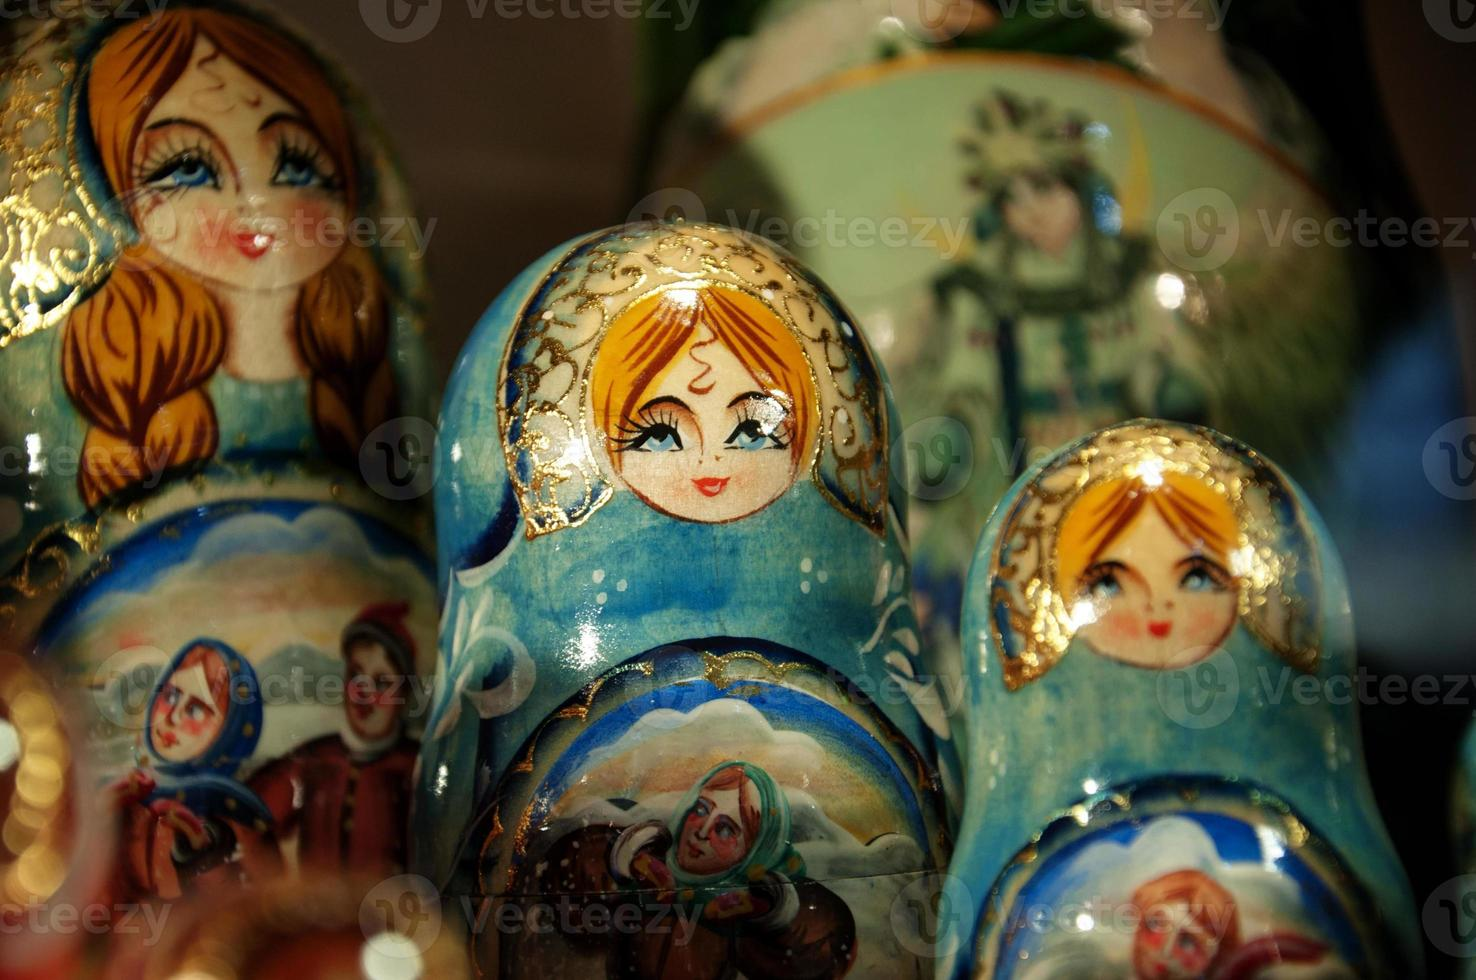 bambole matrioska foto